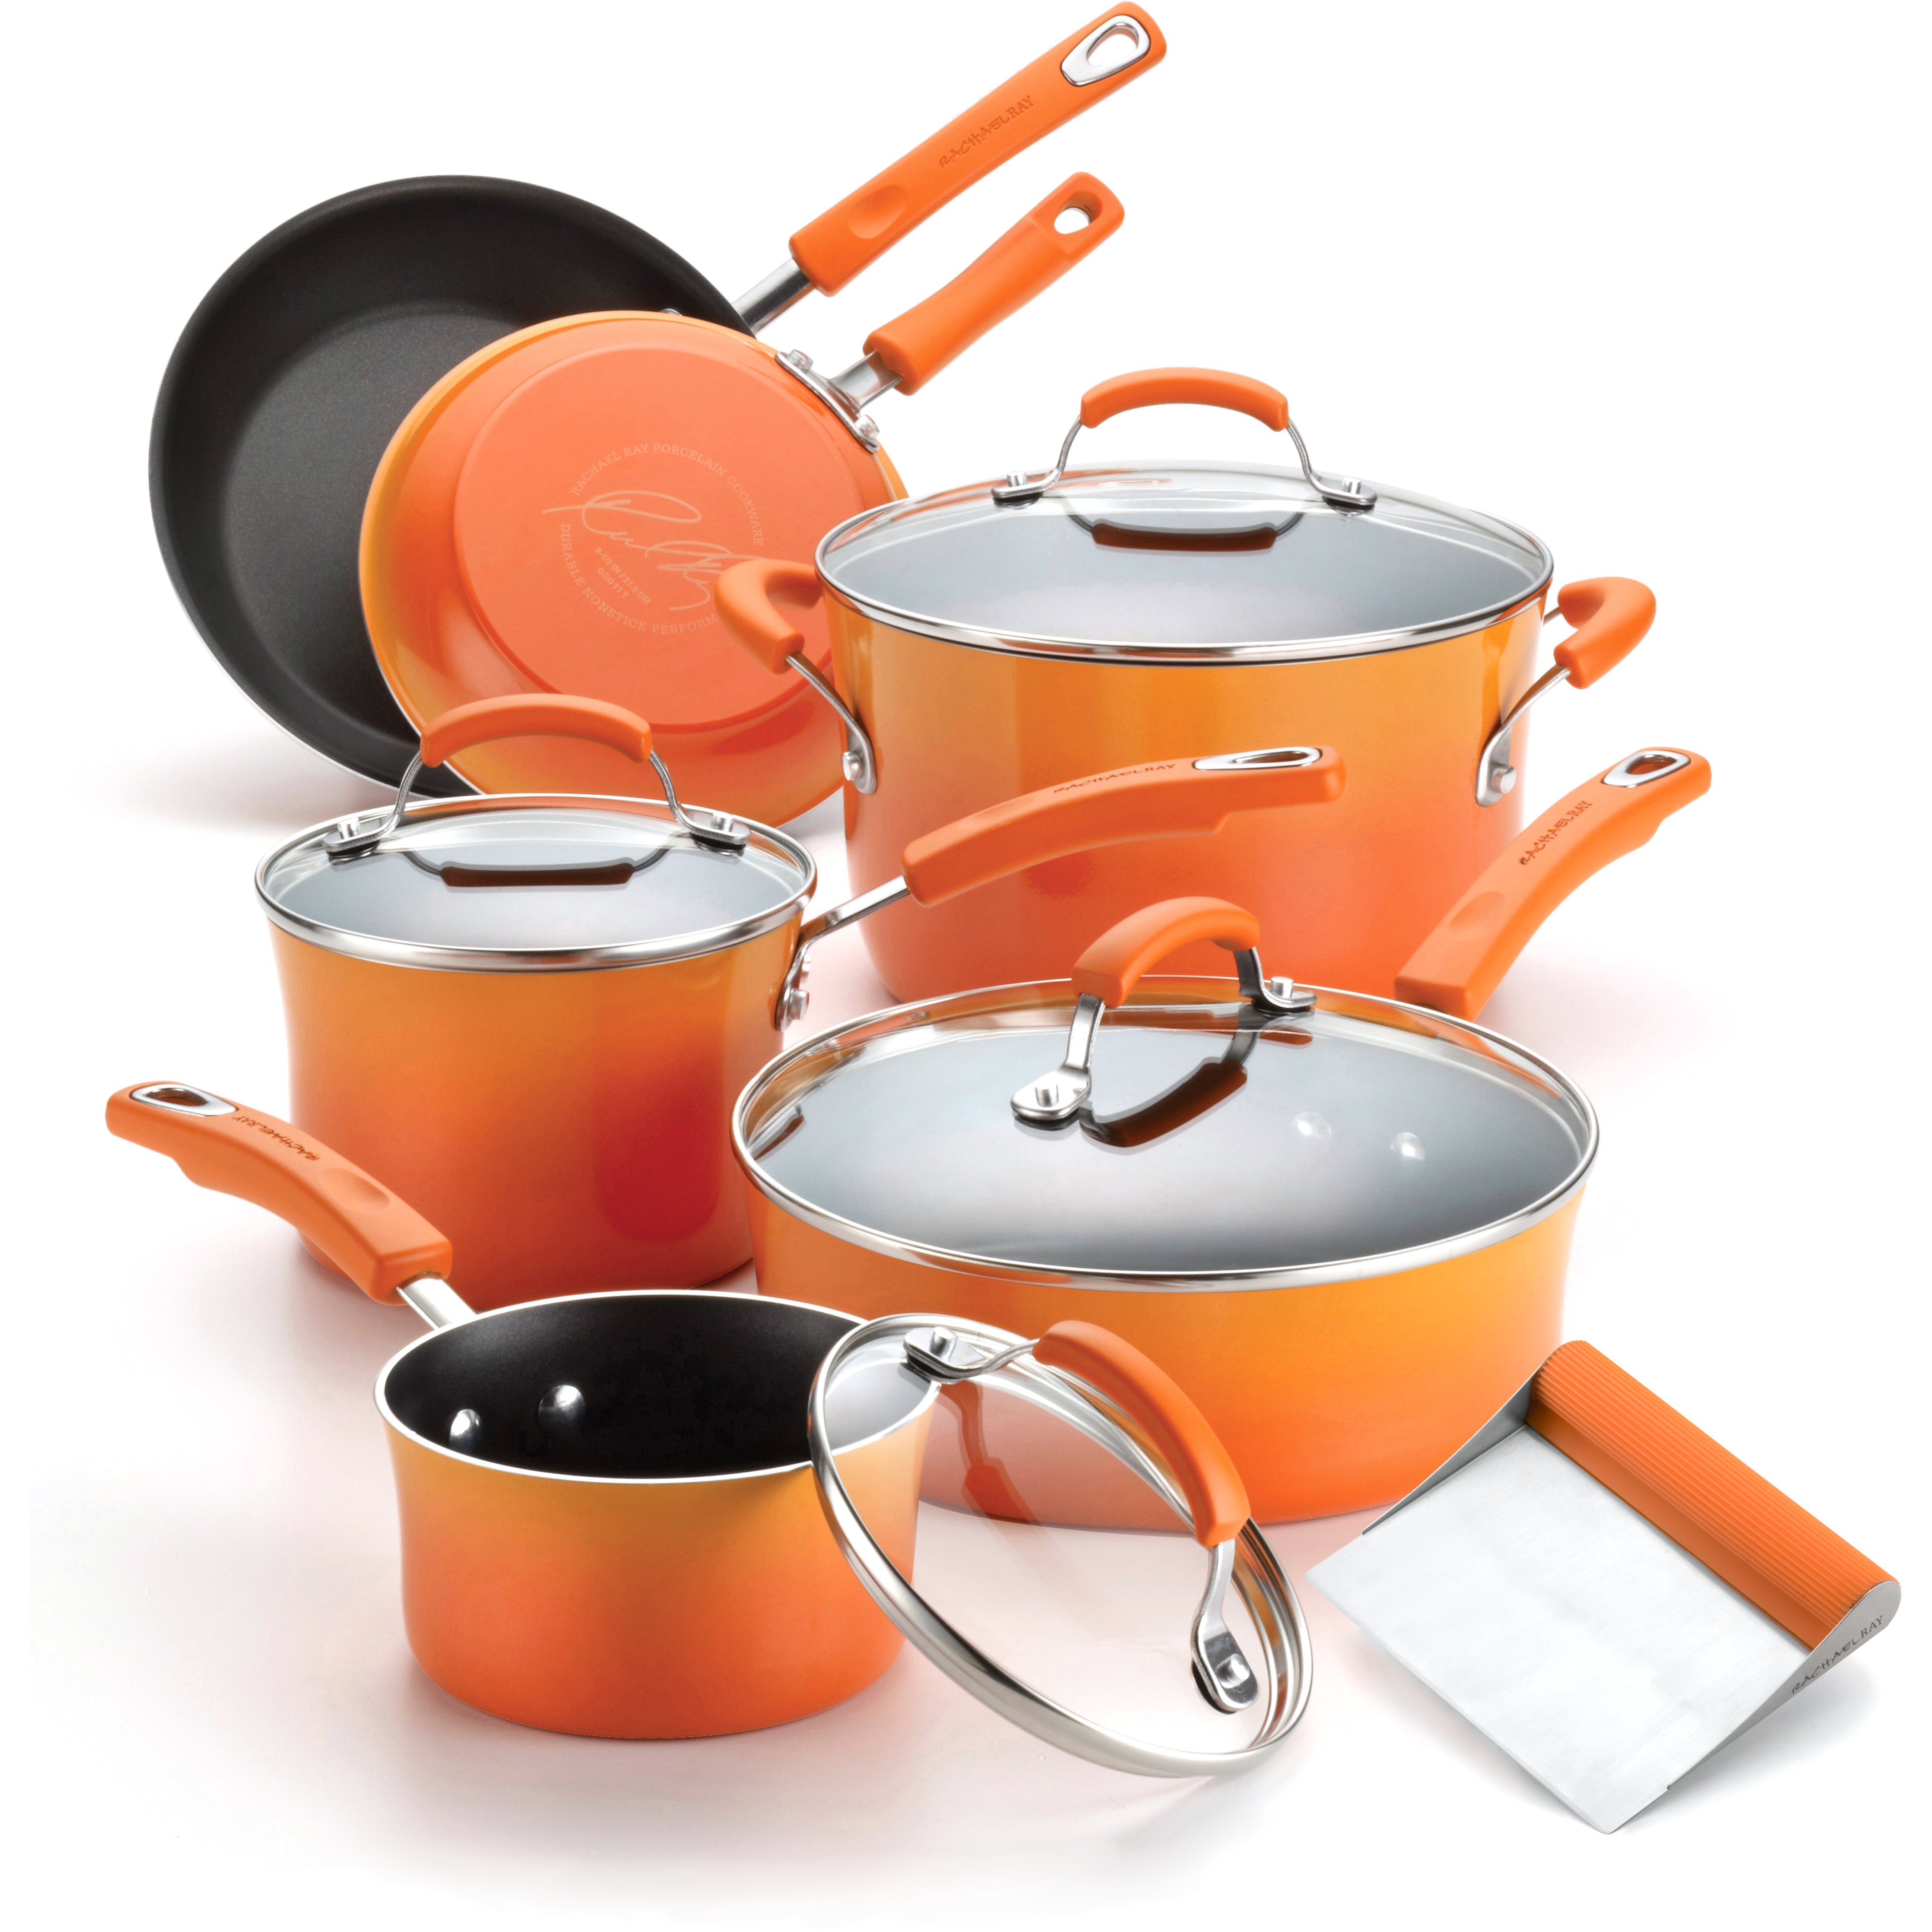 Rachael Ray Orange Porcelain Enamel II 10 Piece Cookware Set with Free Bench Scraper